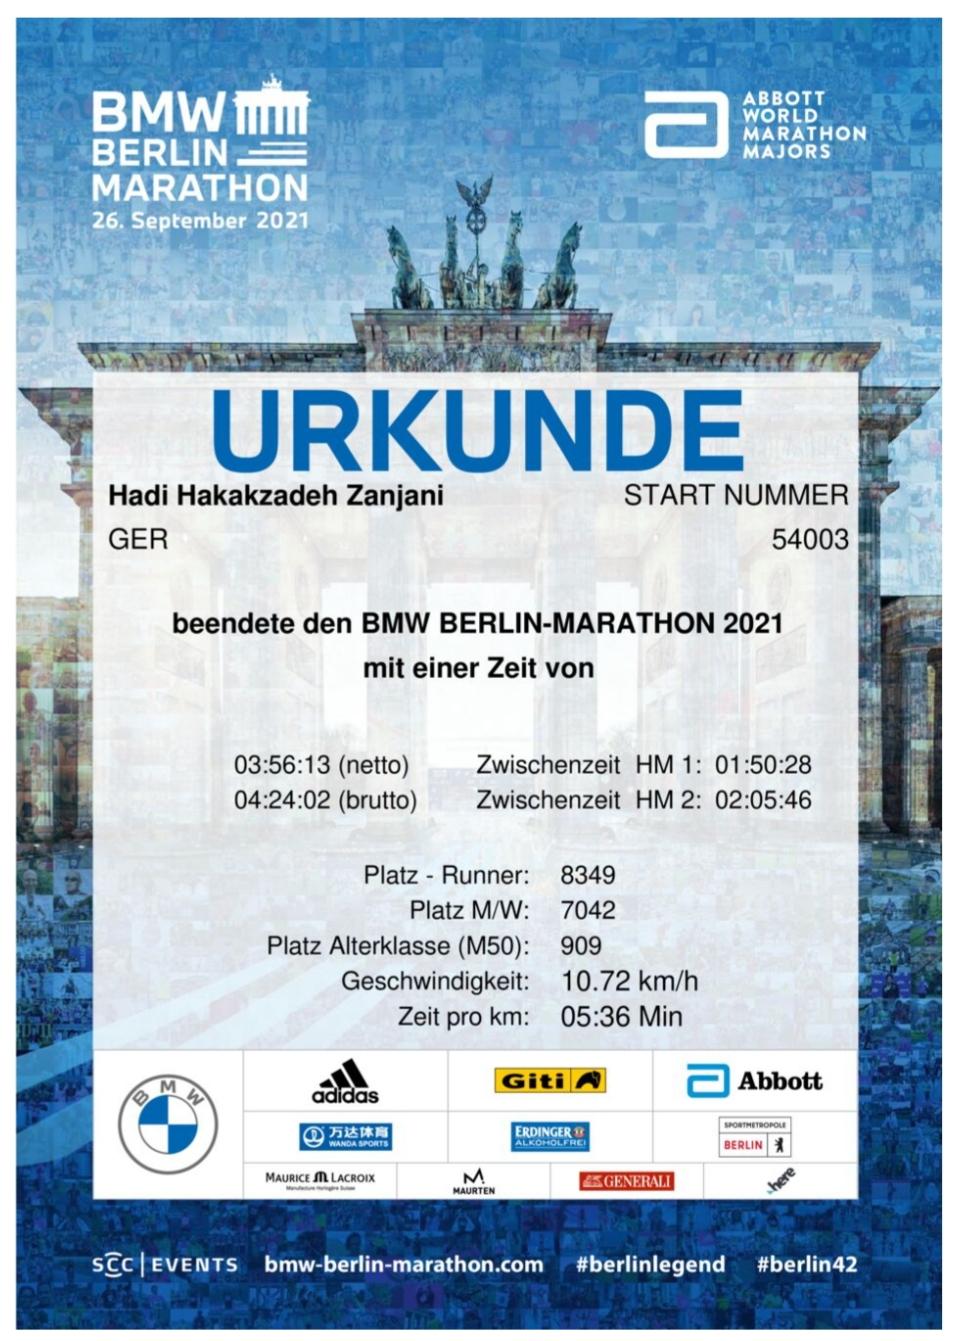 Berlin Marathon 2021 finished